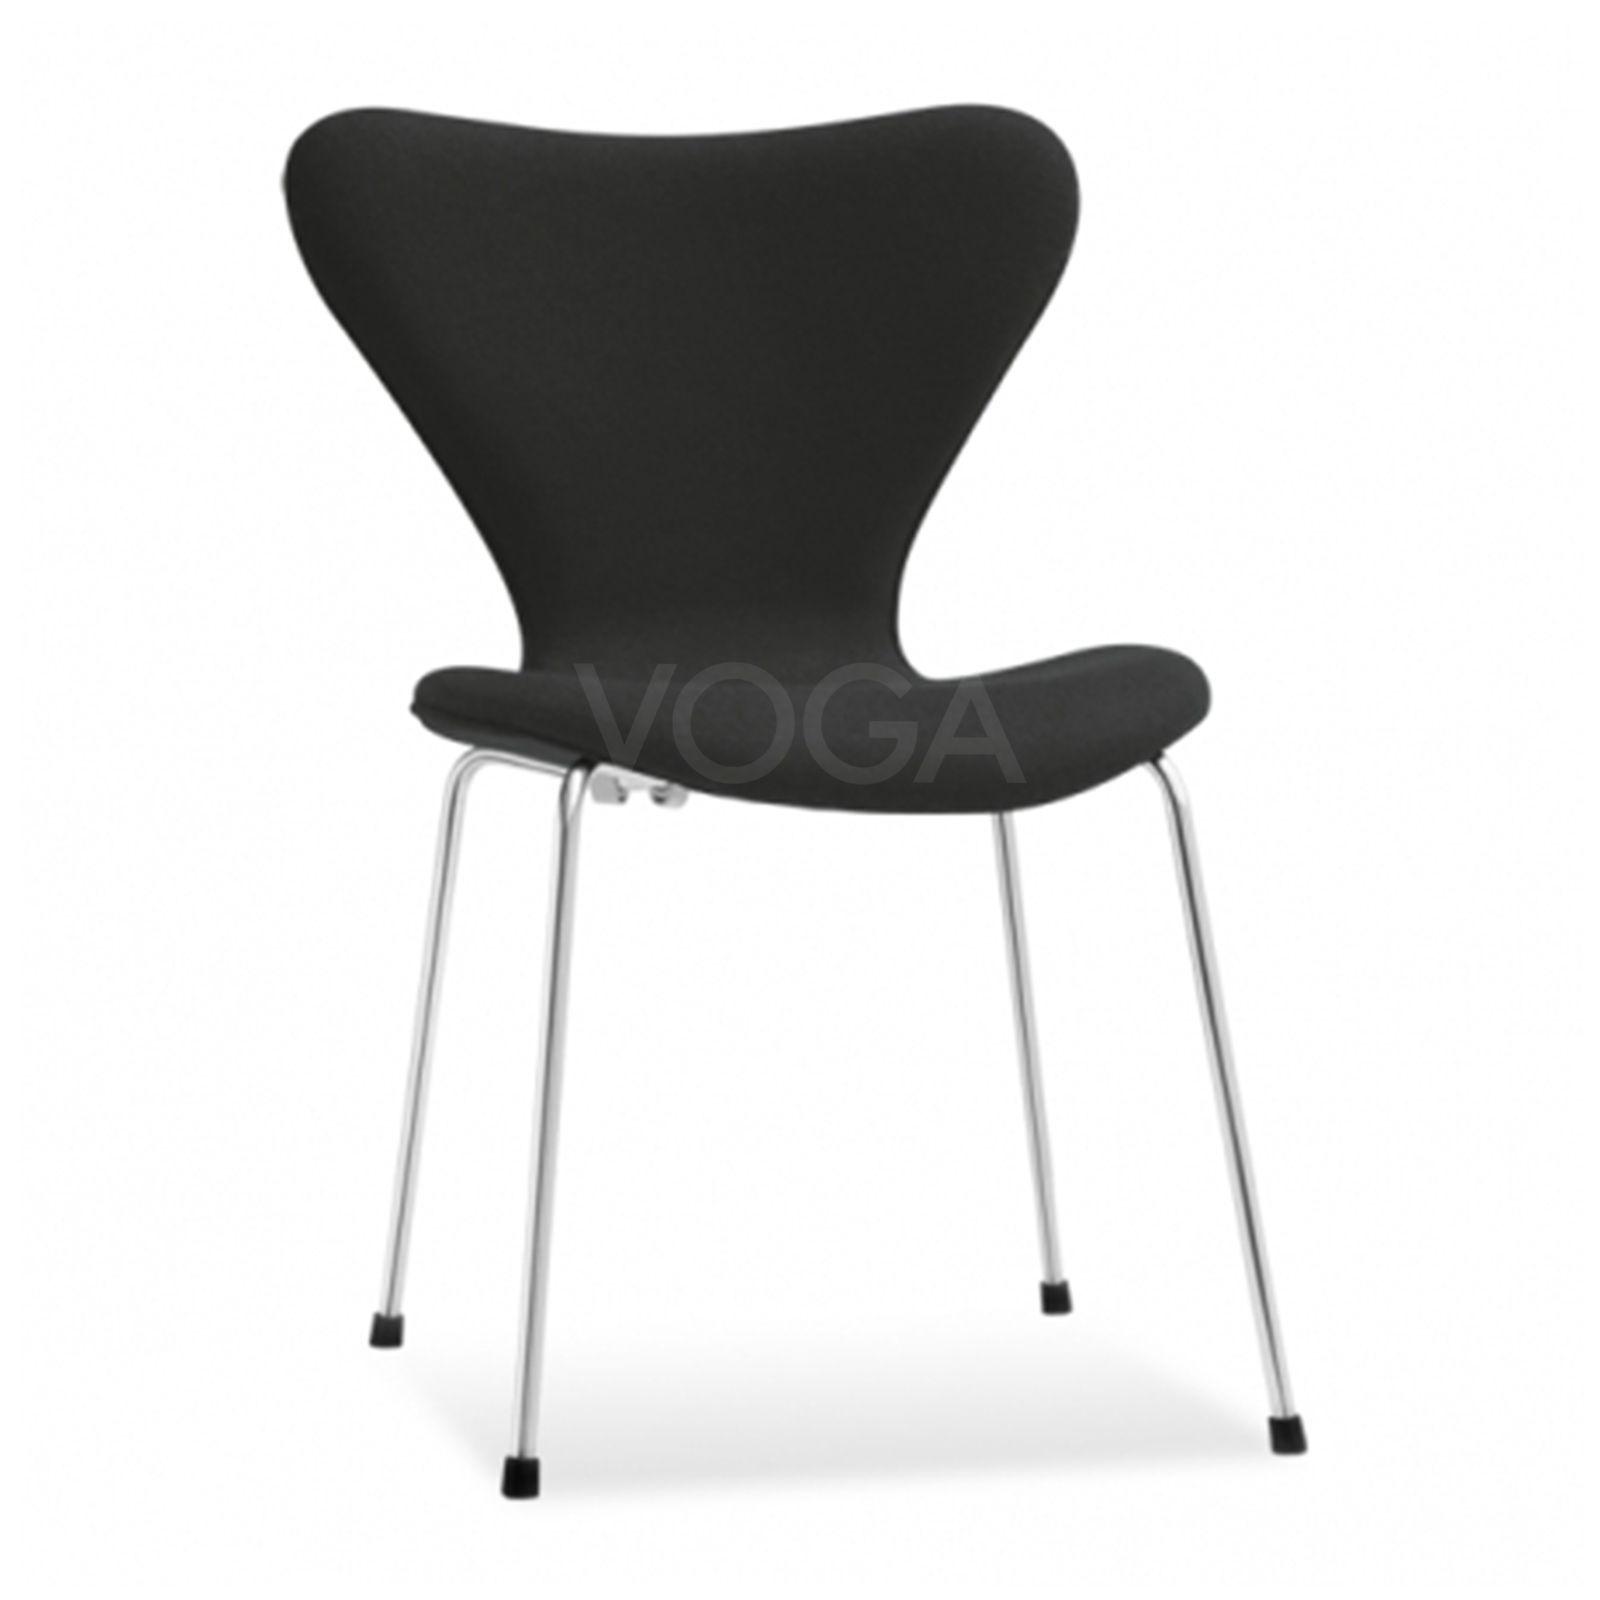 Series 7 Stoel Arne Jacobsen | Originele Kwaliteit | VOGA